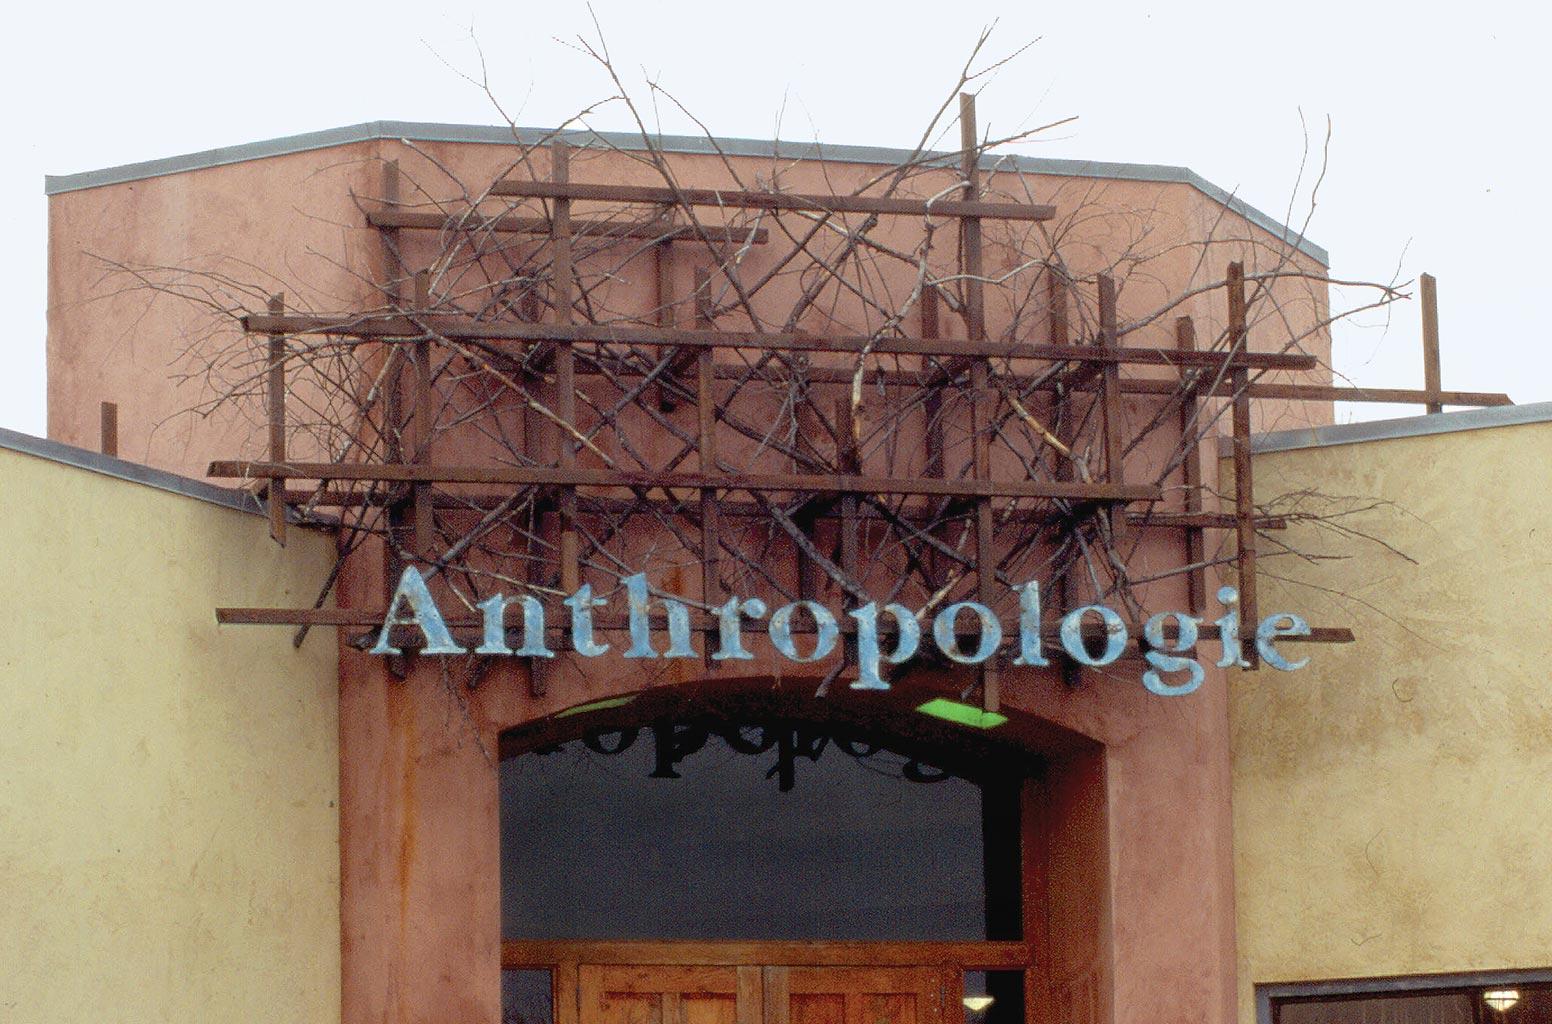 http://gutierrezstudios.com/img/installations/1995/anthropologie/anthropologie-03.jpg